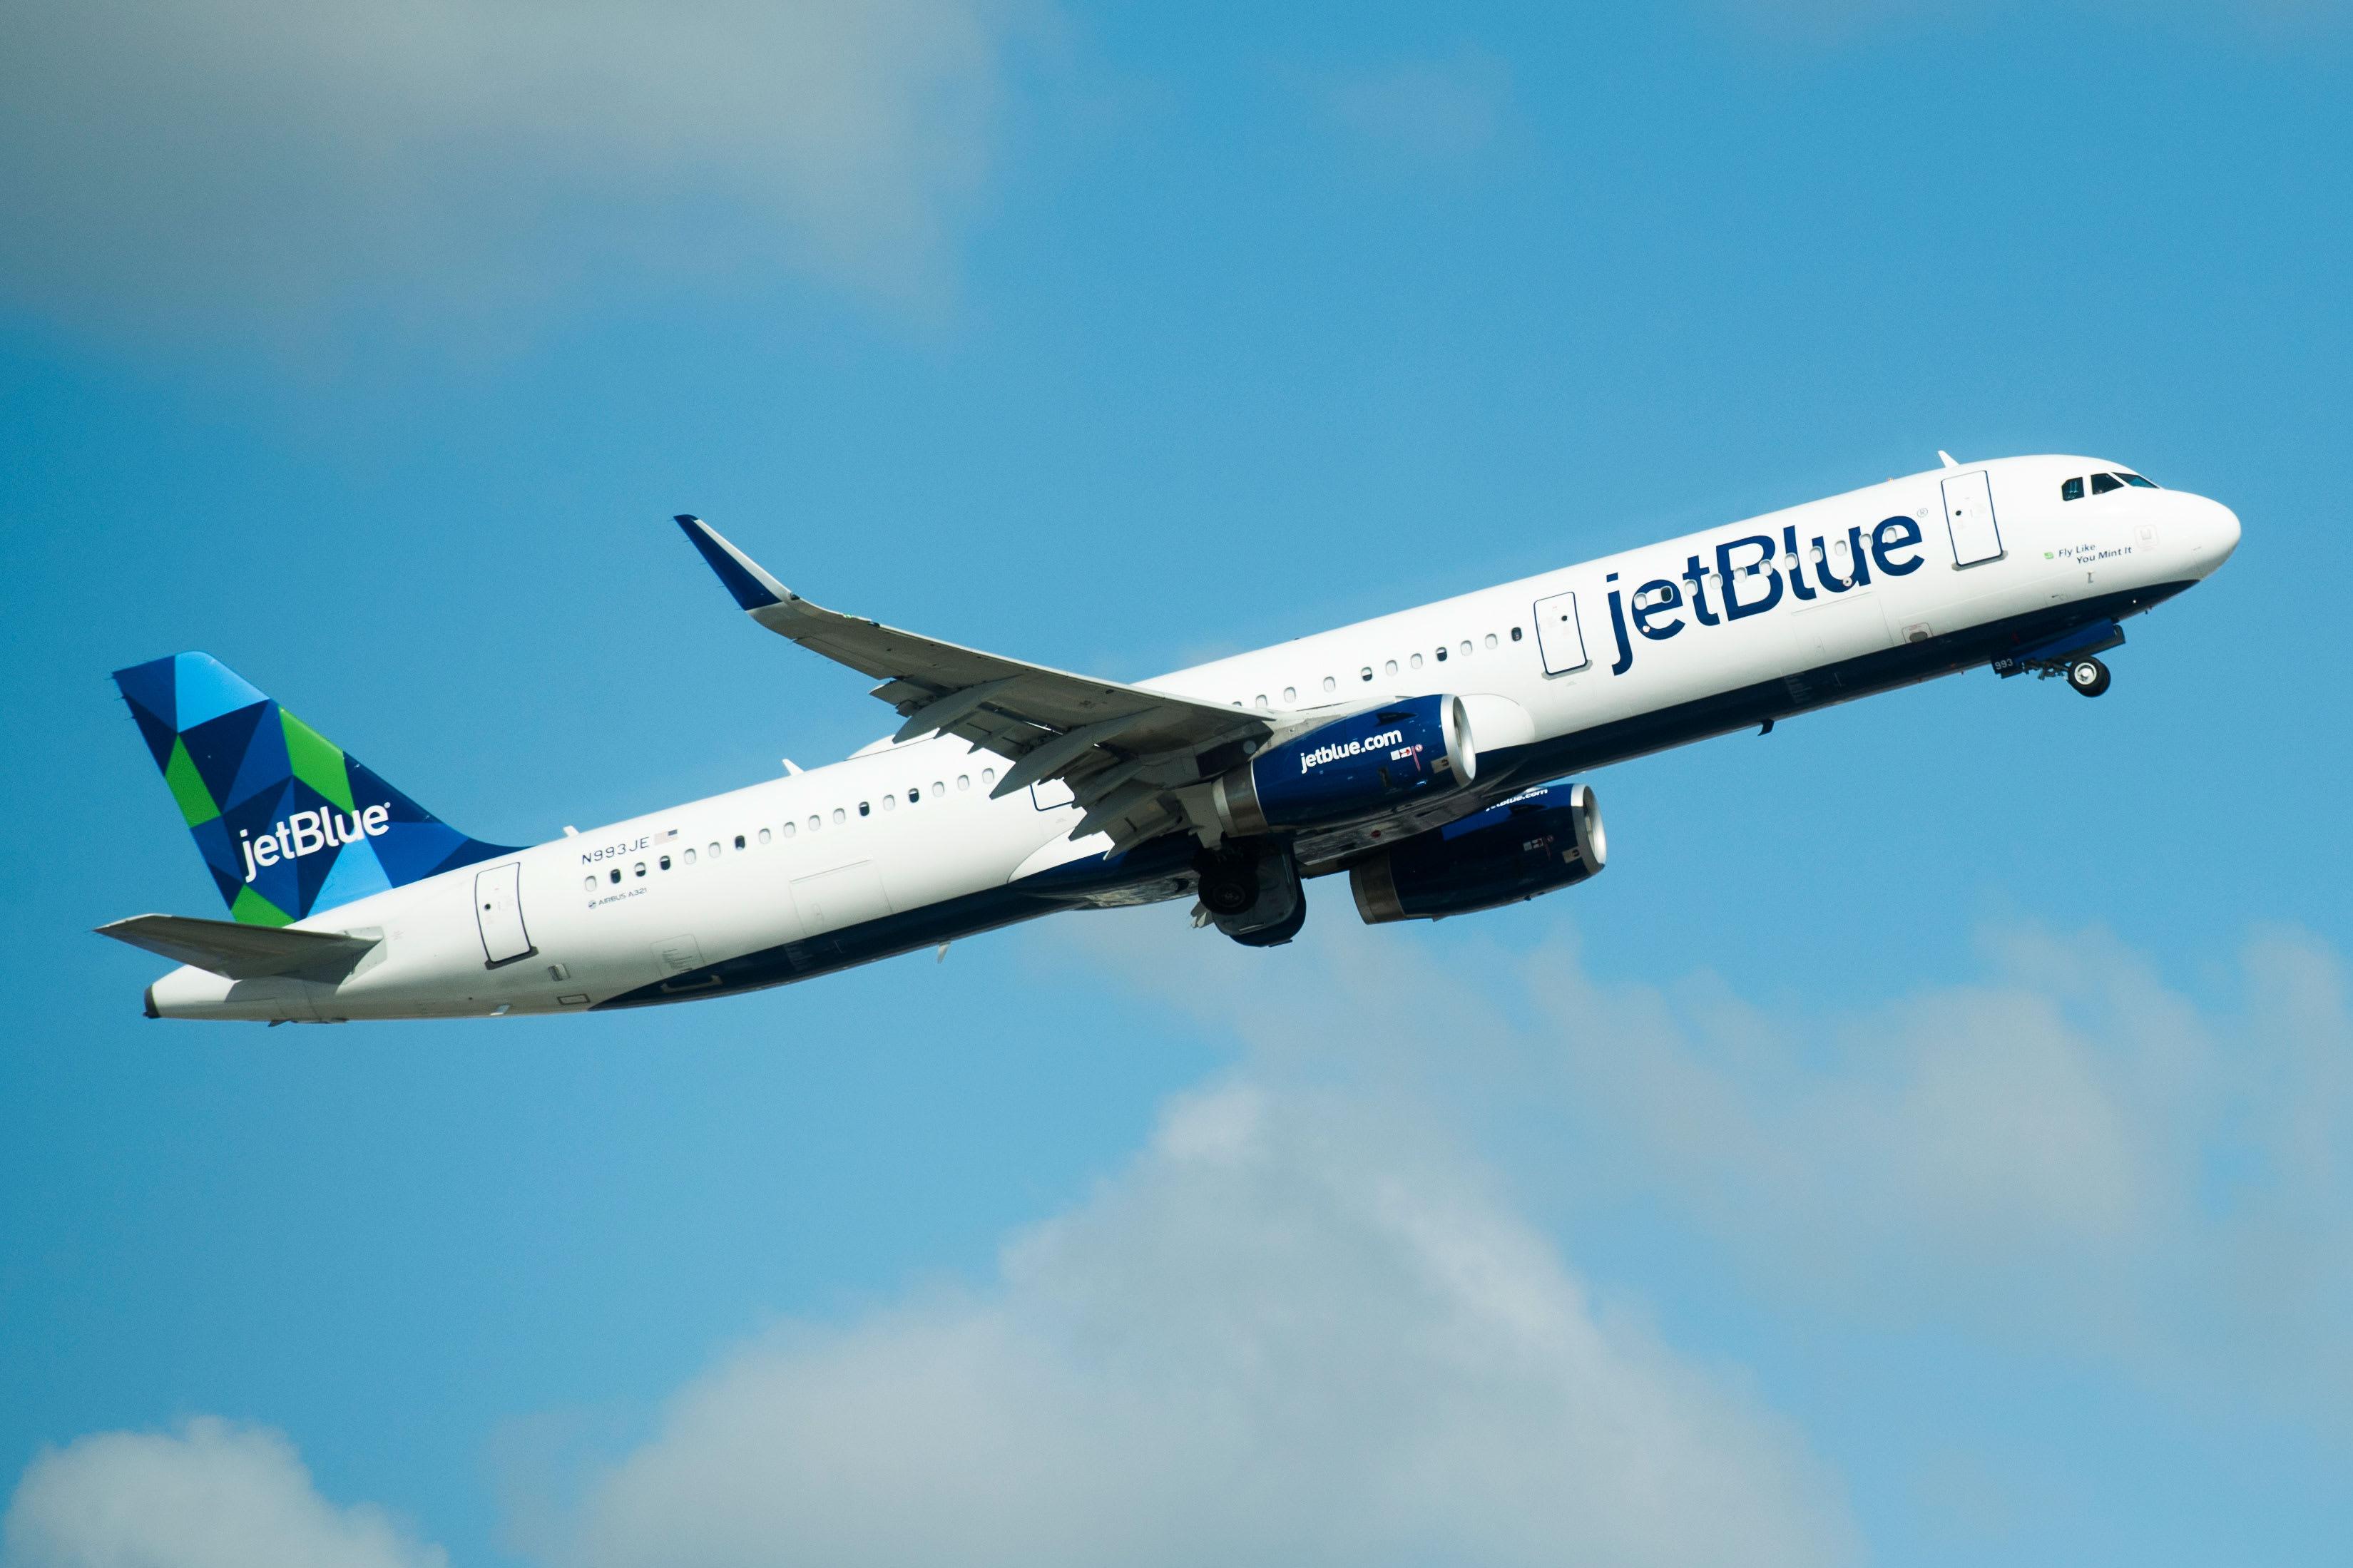 Jetblue plane